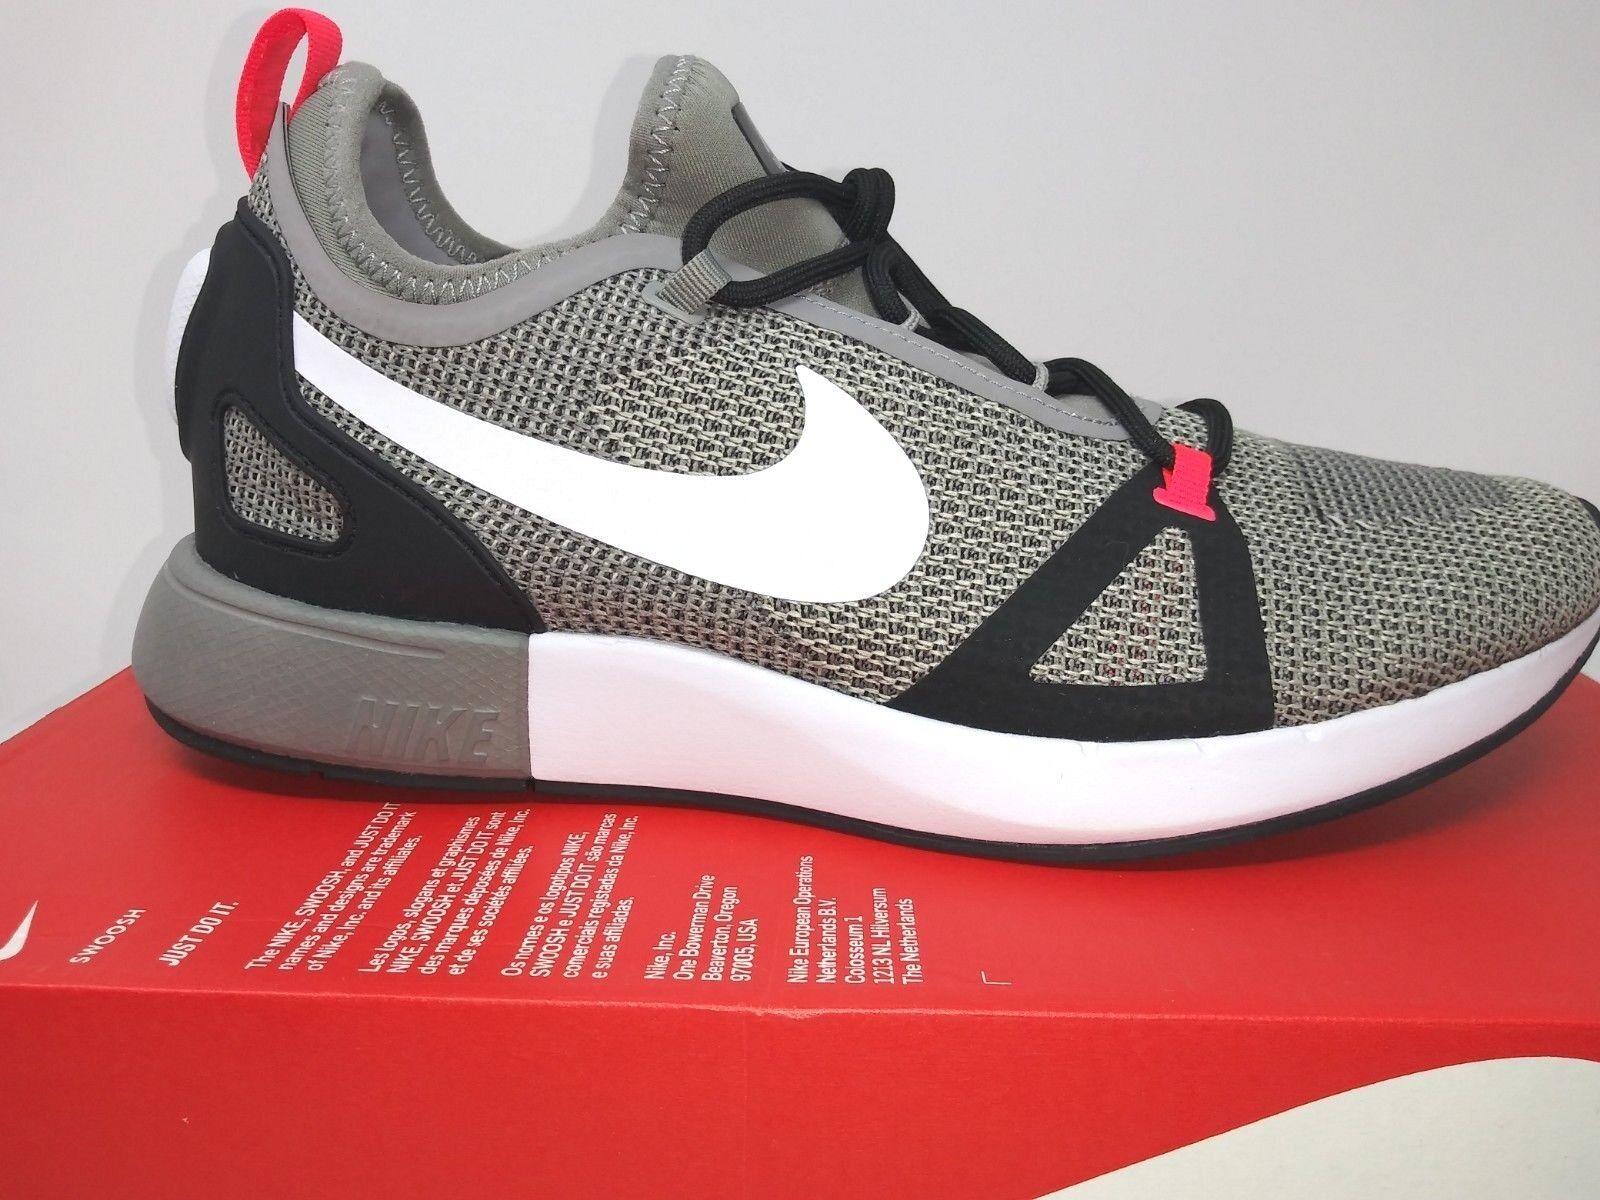 NIKE Men's Duel Racer shoes 918228-008 Light Charcoal Size 9